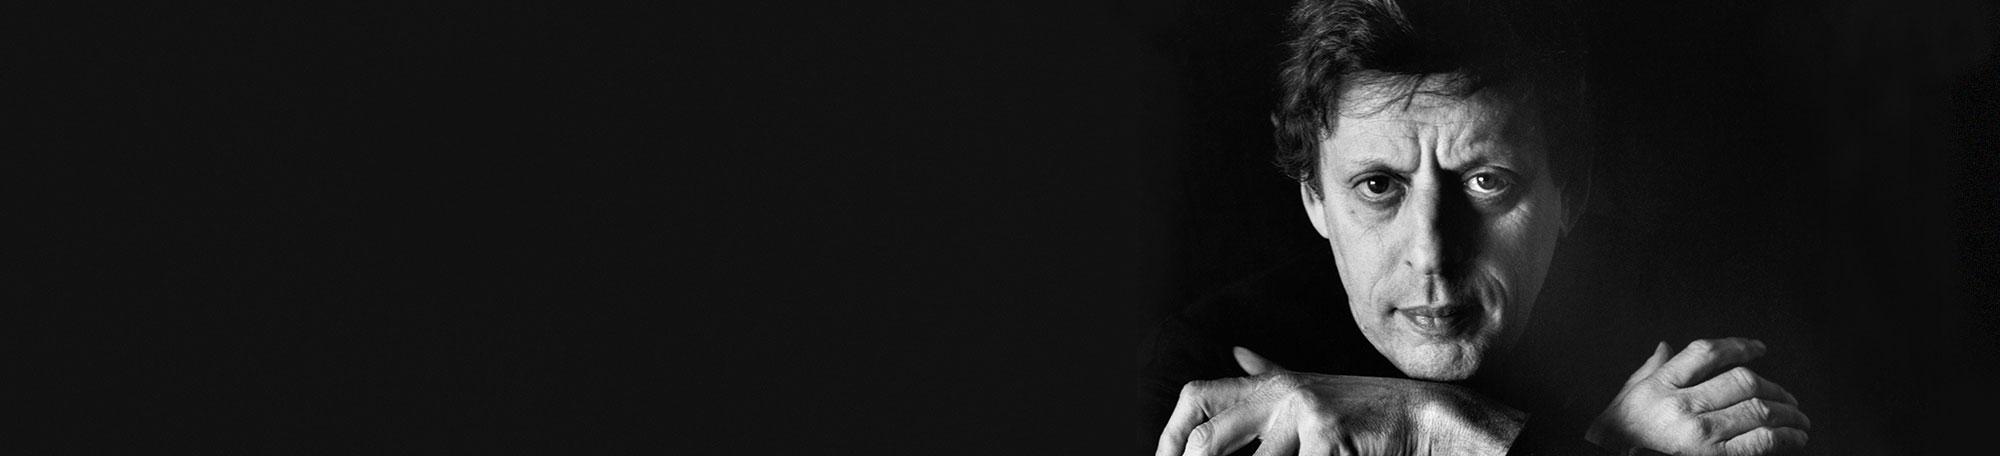 Composer and UChicago alumnus Philip Glass